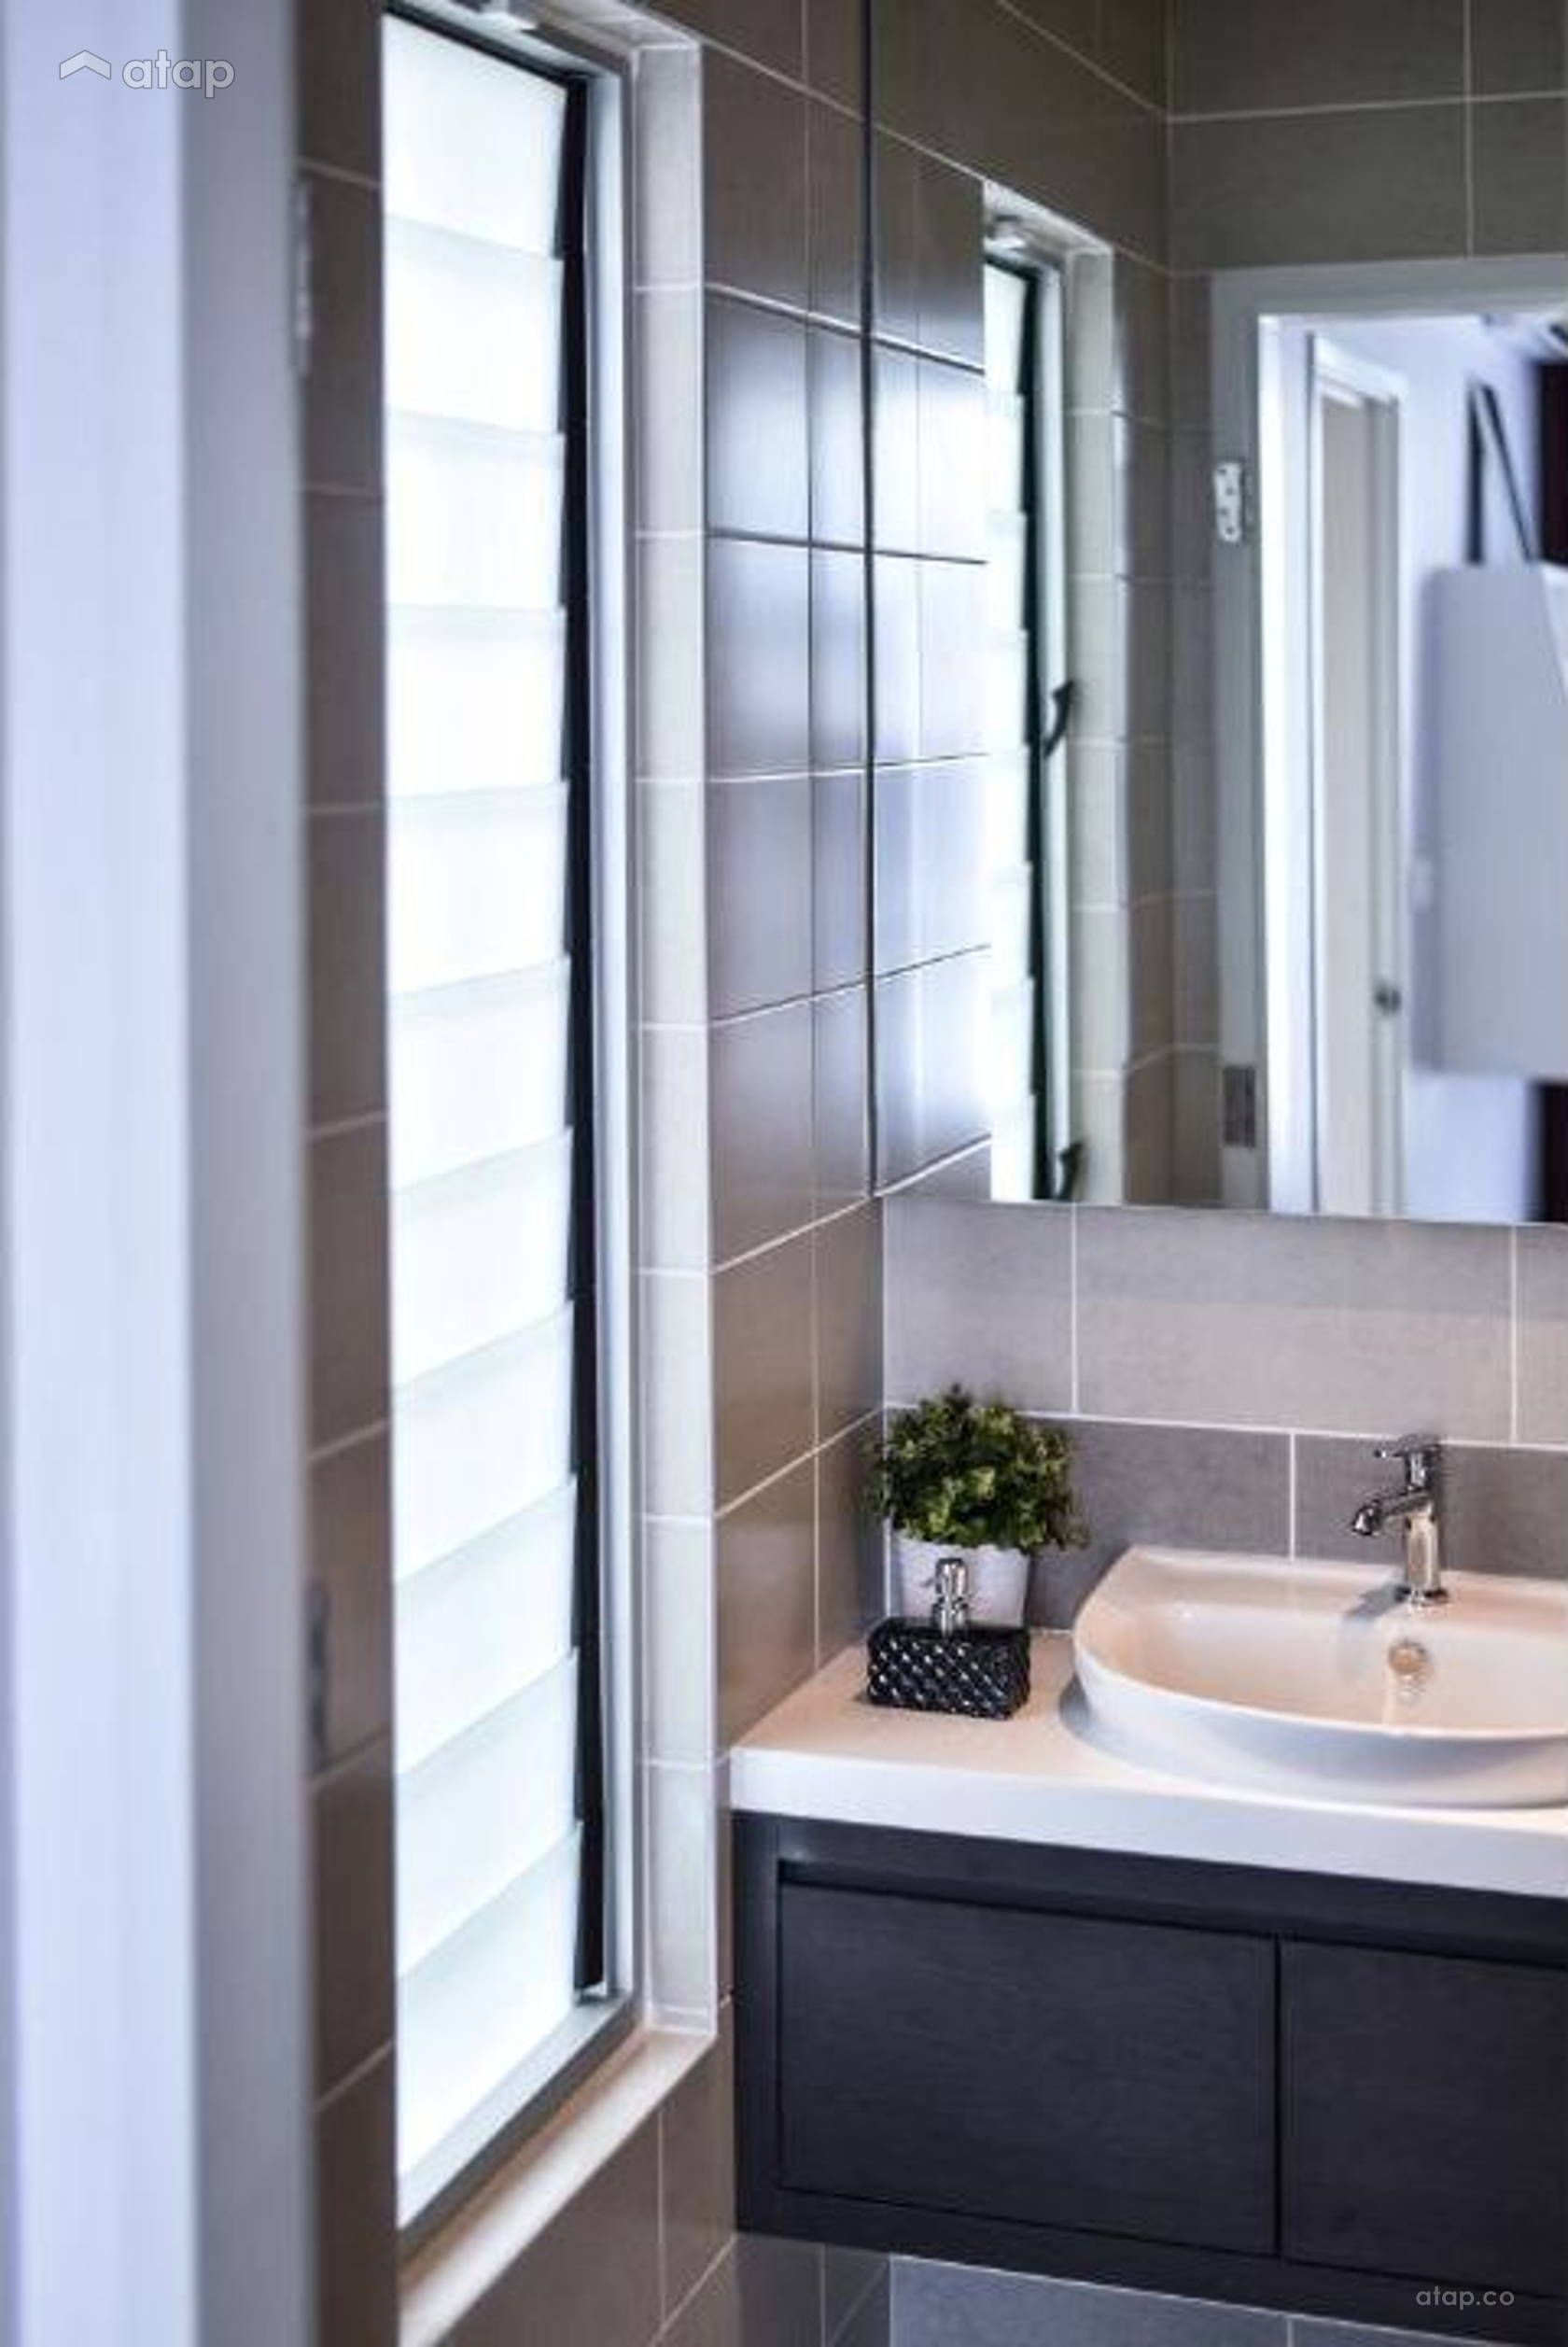 Bathroom Terrace Design Ideas Photos Malaysia Atap Co Terrace Design Bathroom House Bathroom